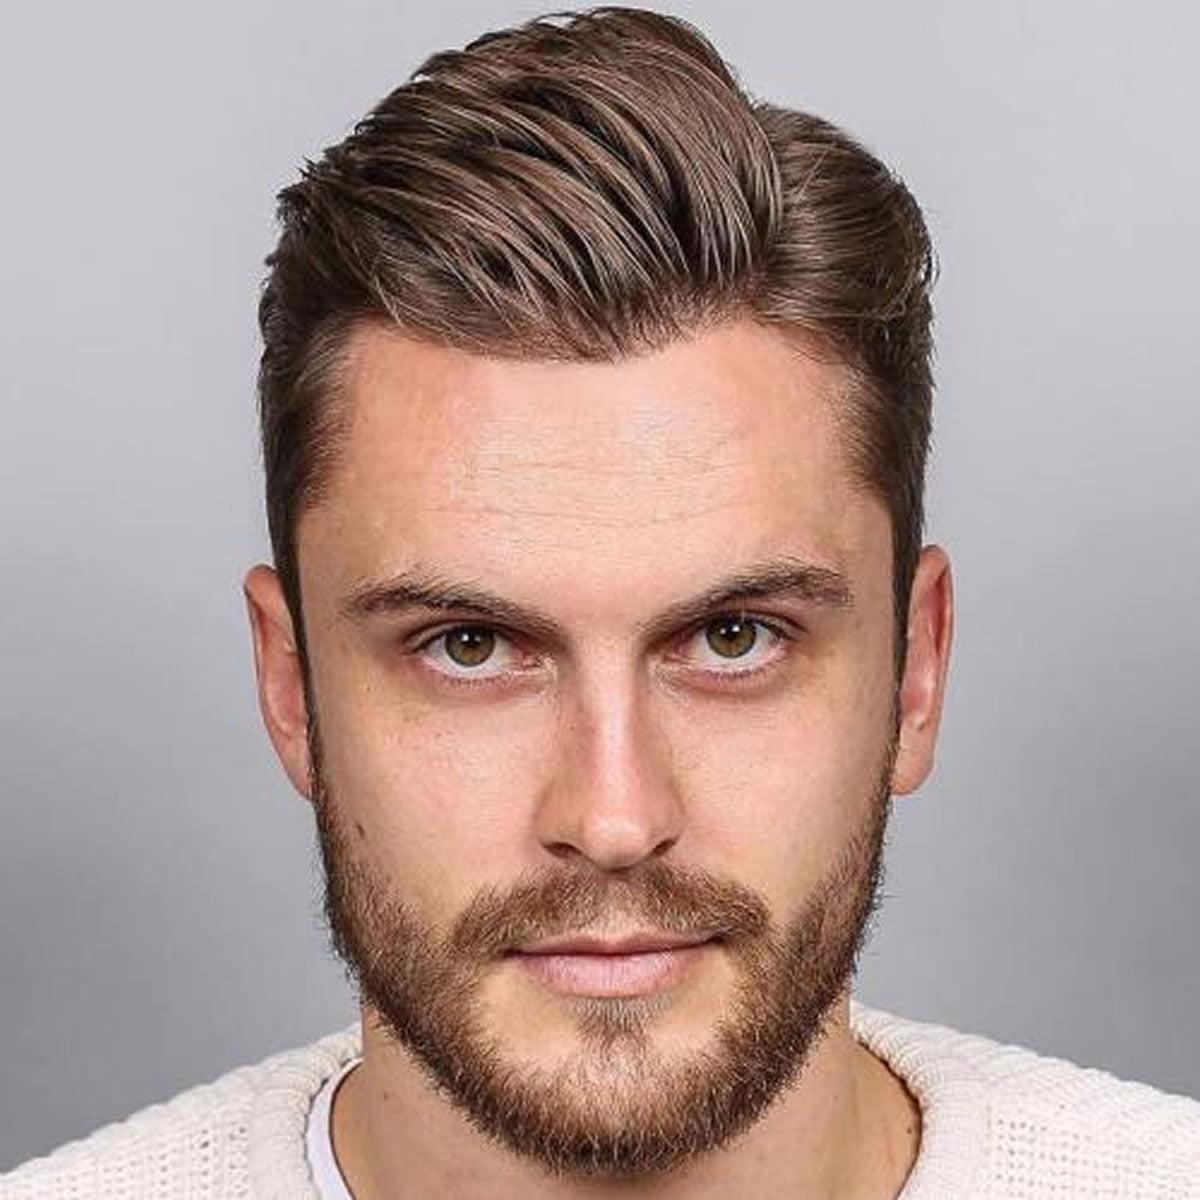 2018 Short Haircuts for Men  17 Great Short Hair Ideas